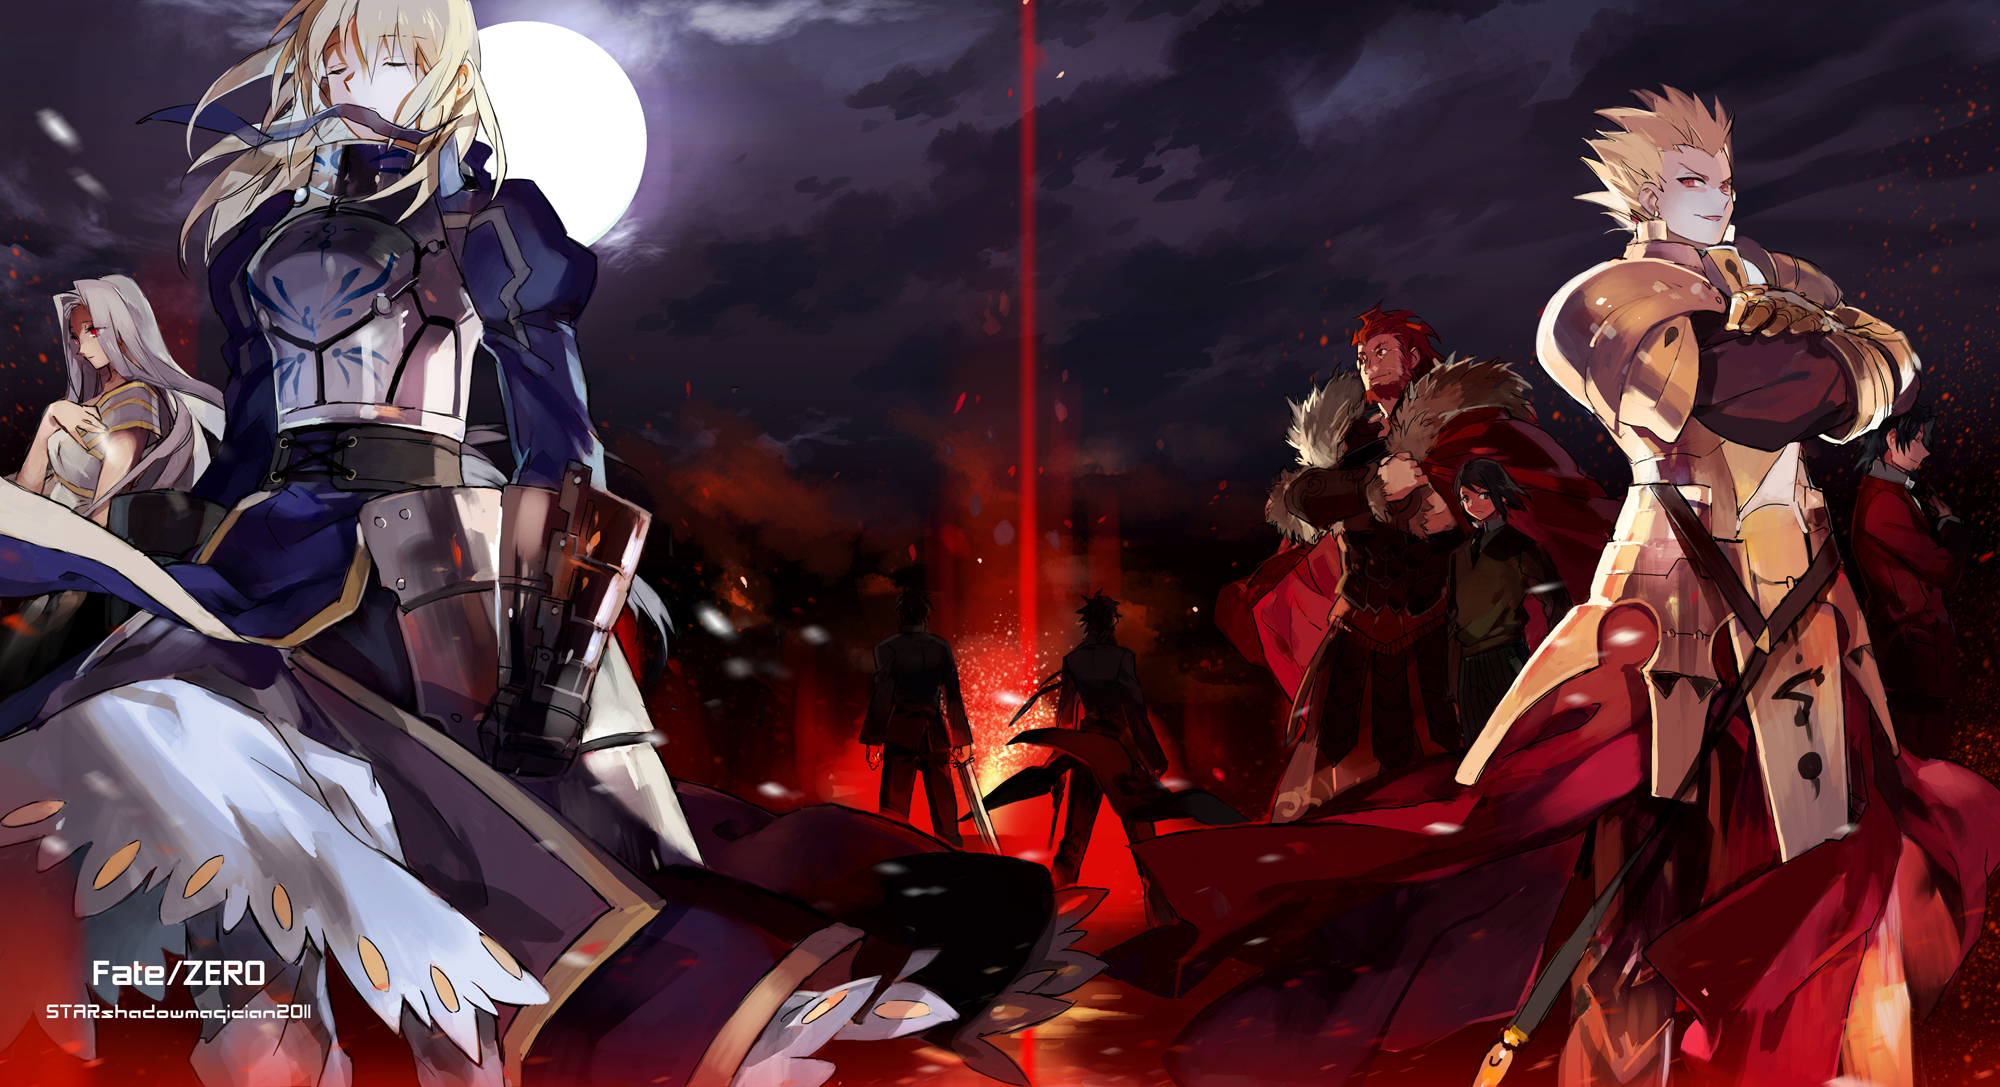 armor emiya kiritsugu fate stay night fate zero gilgamesh kotomine 2000x1087